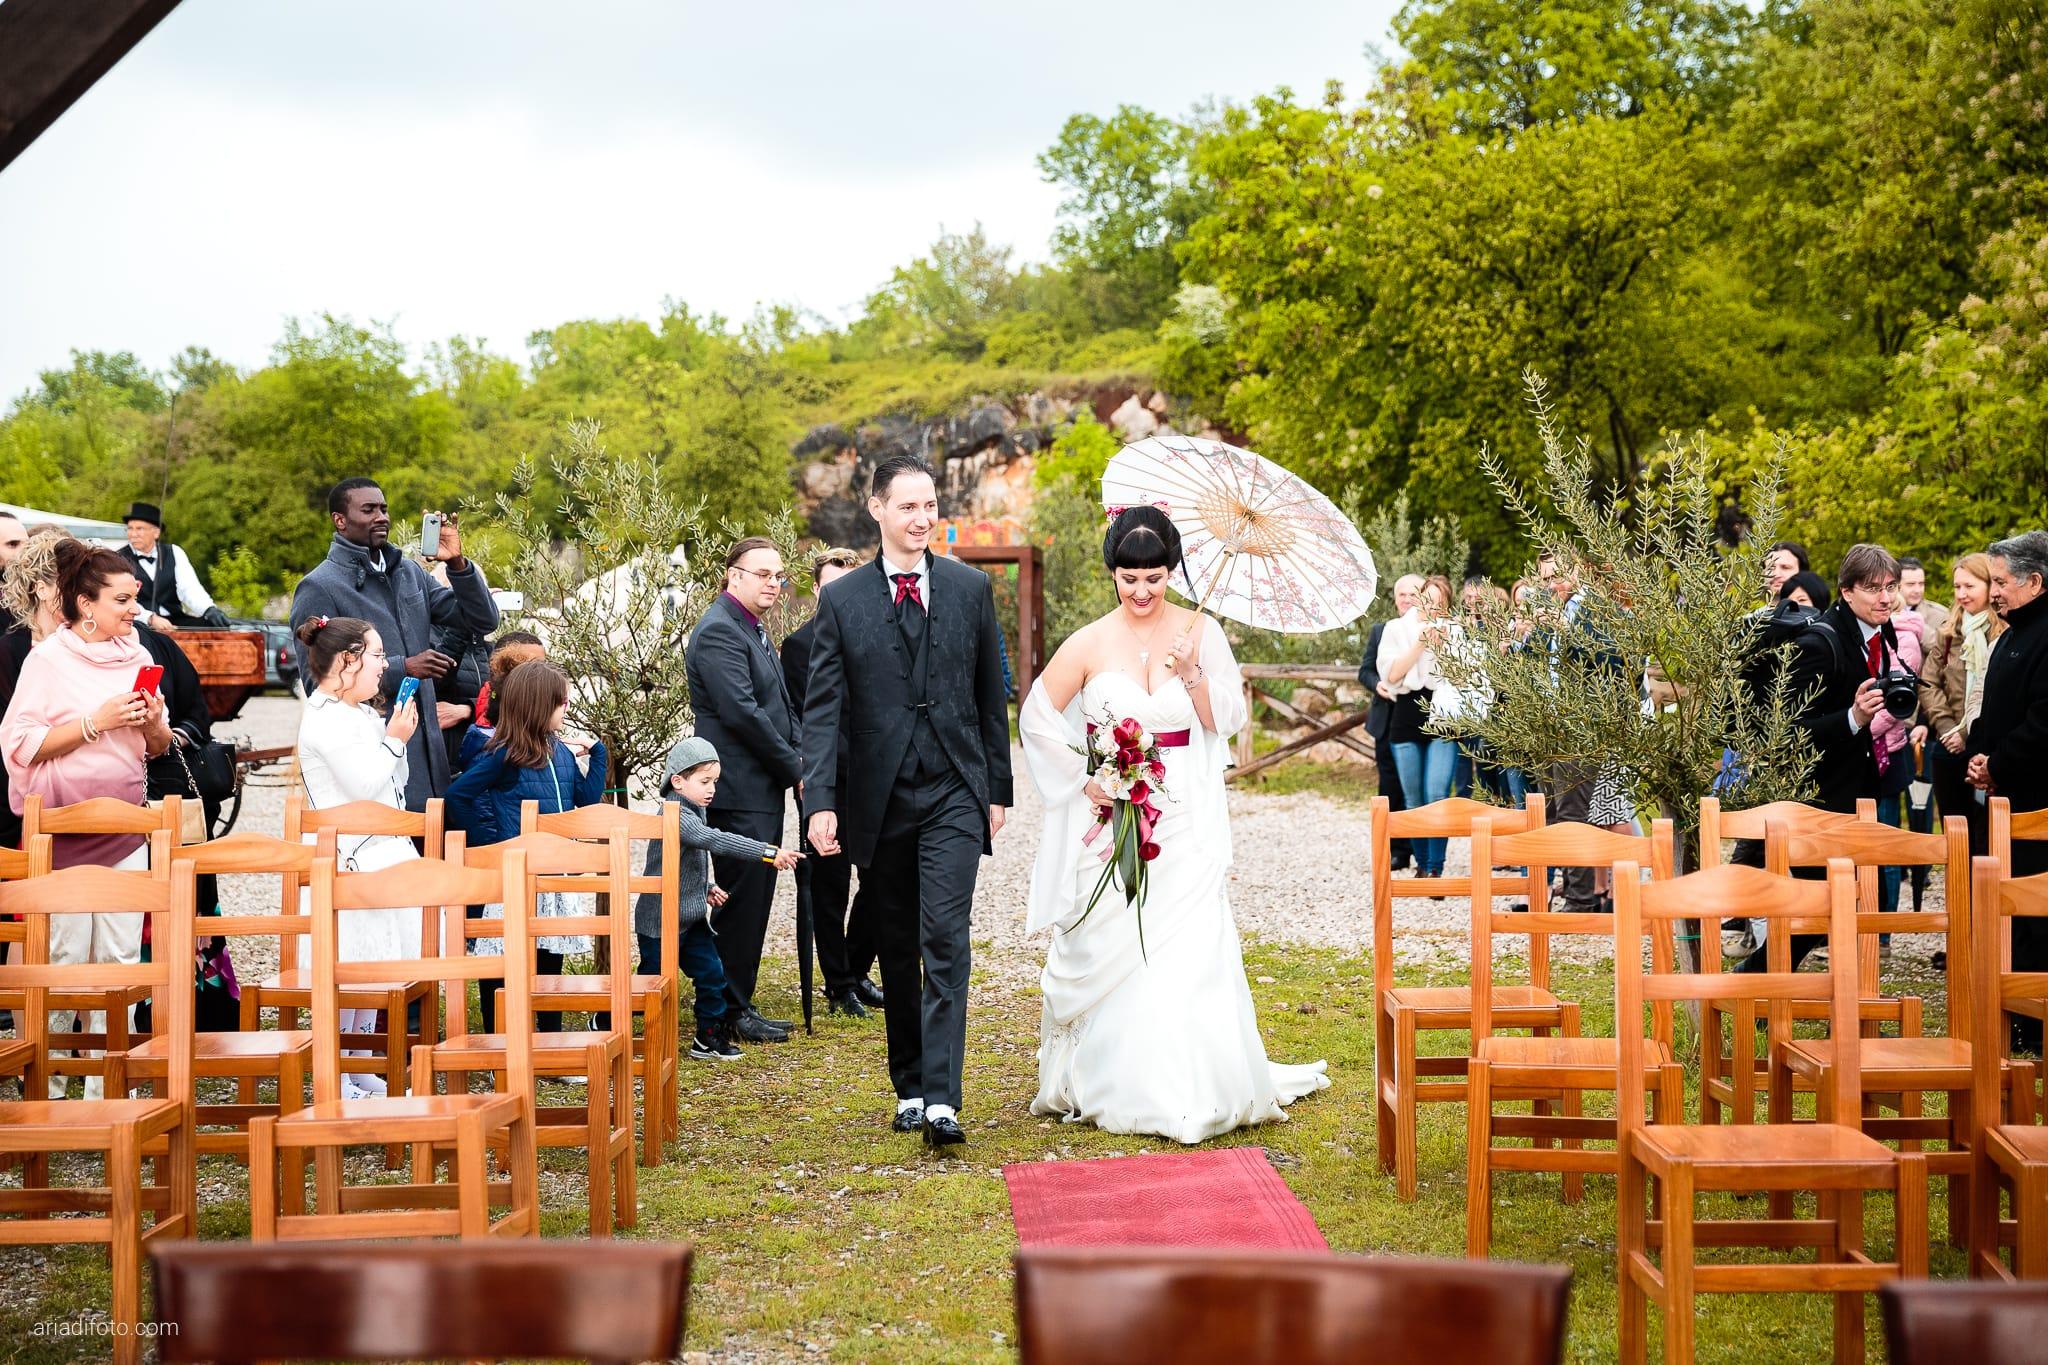 Agnese Alessandro Matrimonio Centro Visite Gradina Doberdo Gorizia Farra cerimonia ingresso sposi